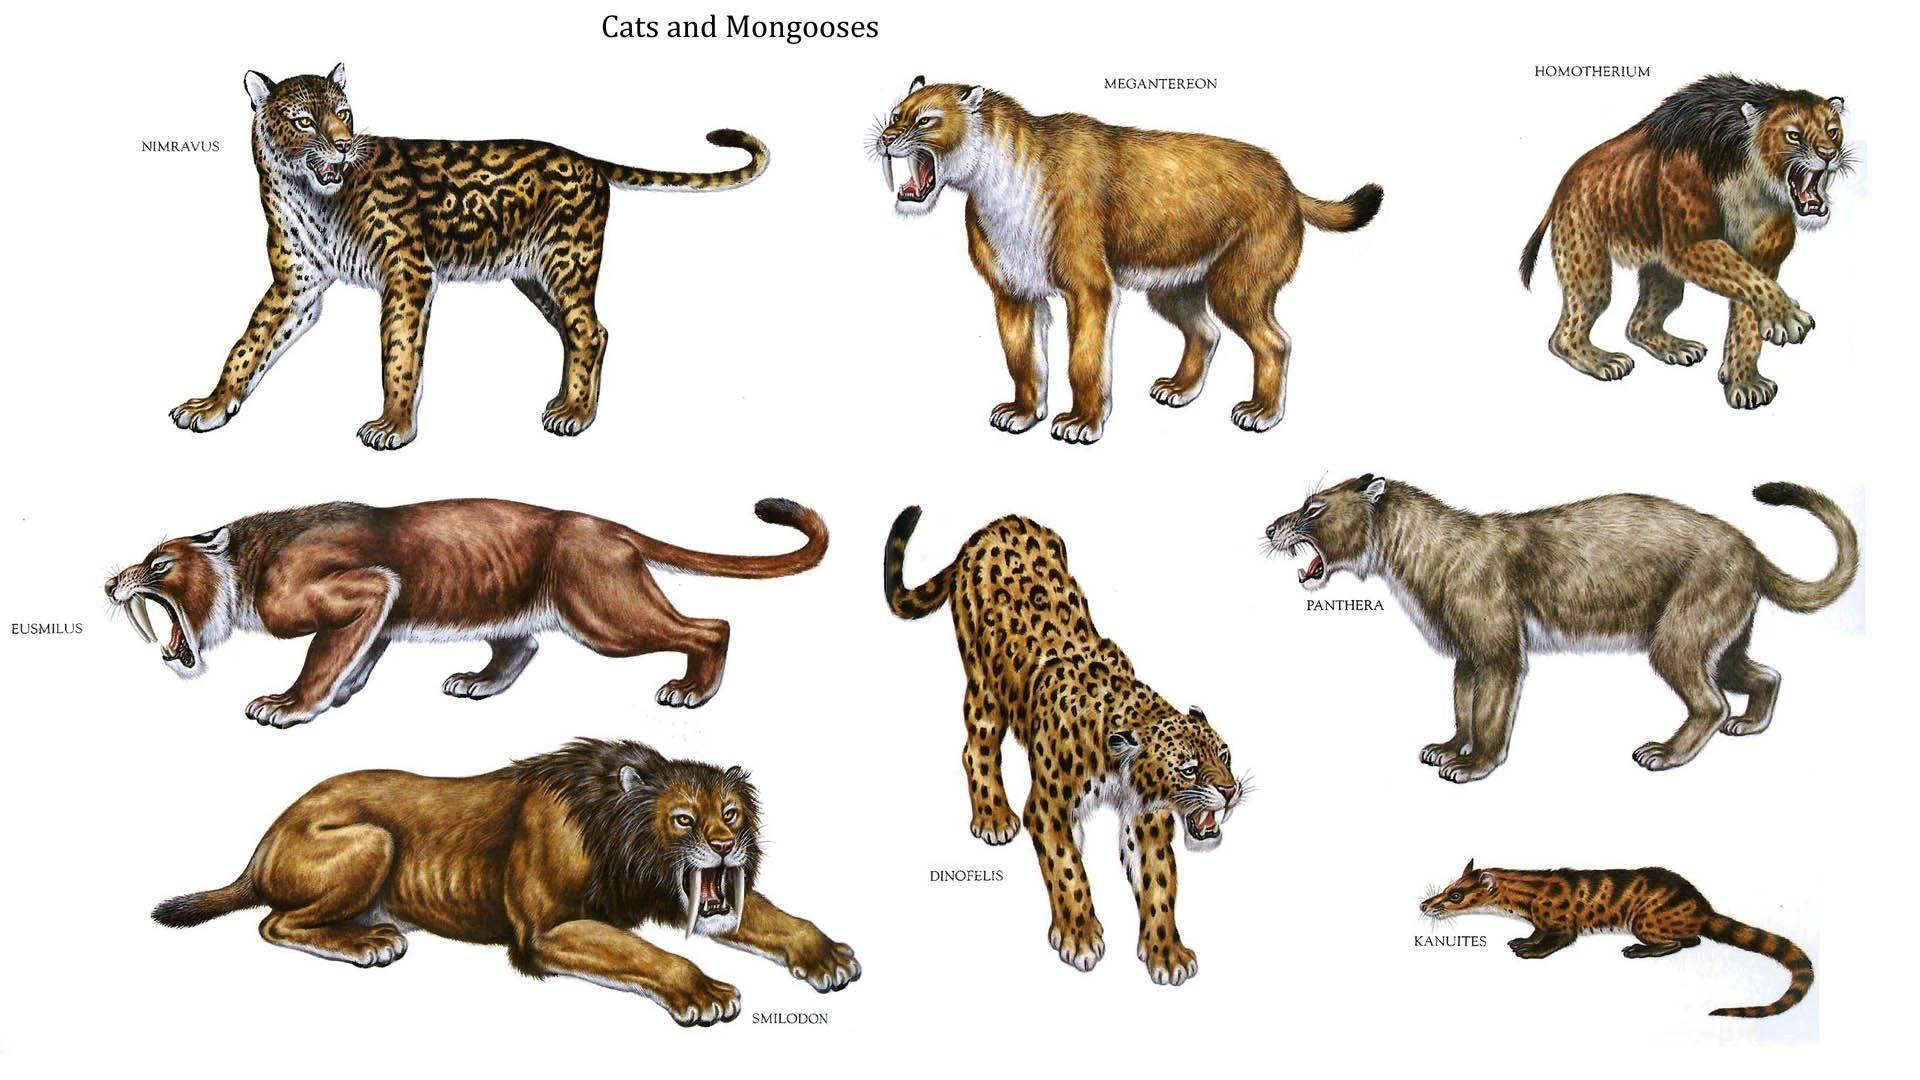 Семейство кошачьих: фото с названиями представителей, разновидности хищников